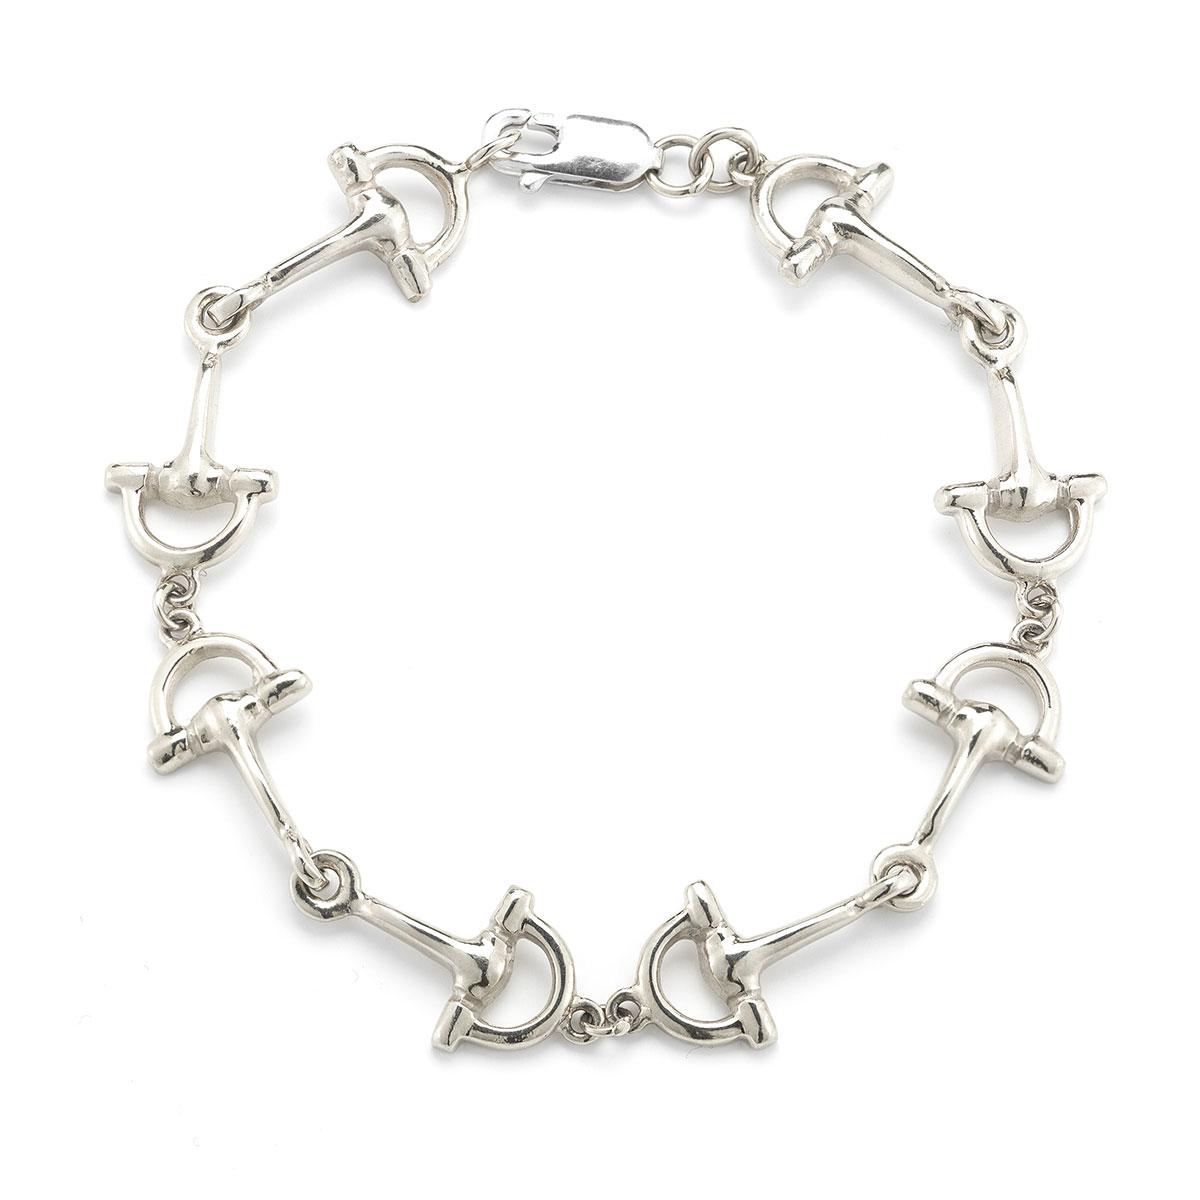 HL0802 Snaffle Bit Bracelet